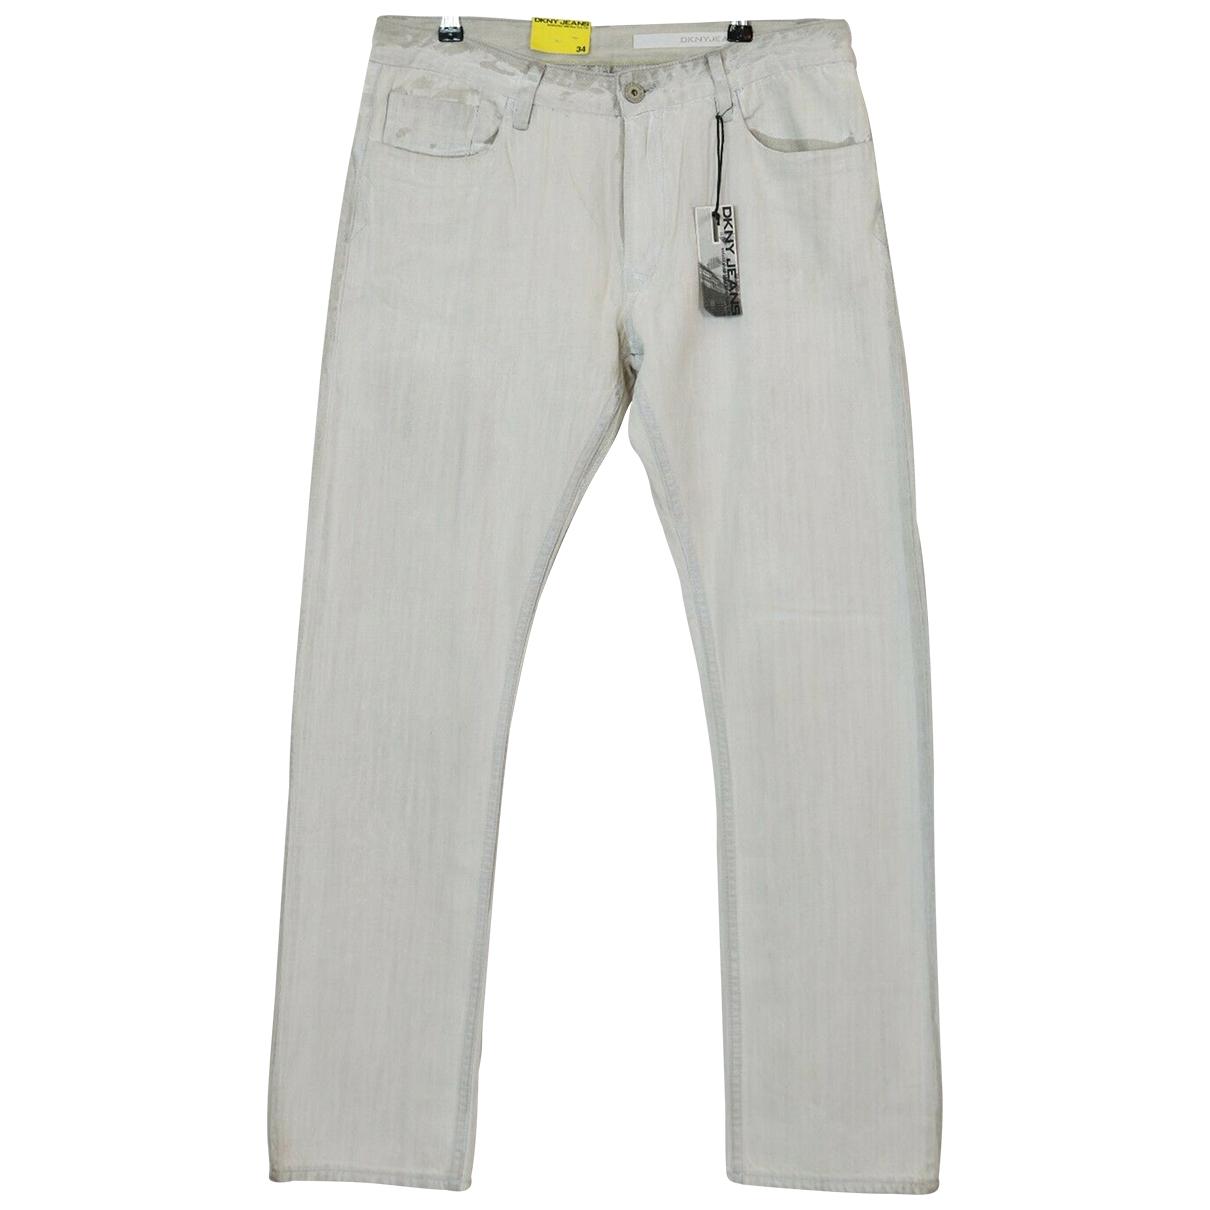 Dkny \N White Cotton Jeans for Men 34 US